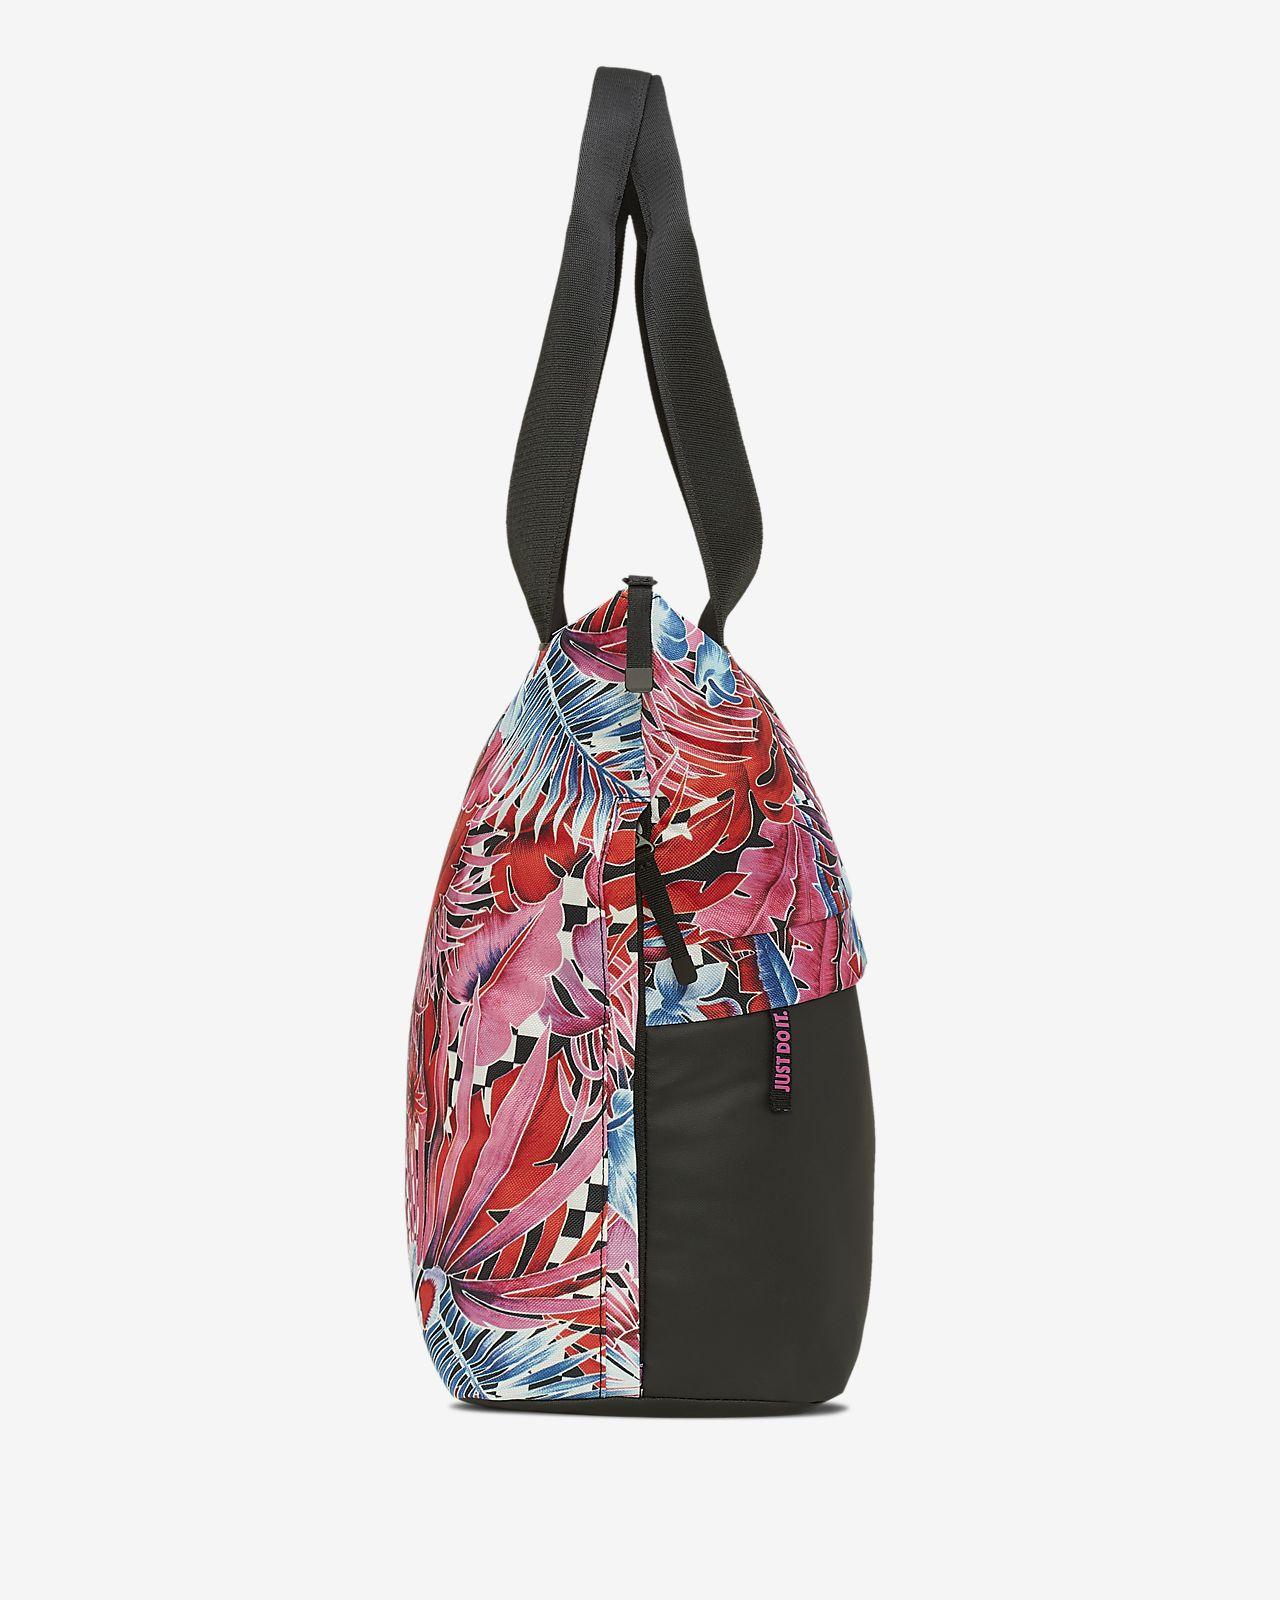 1775a0bf2d Γυναικεία τσάντα ώμου για προπόνηση Nike Radiate. Nike.com GR